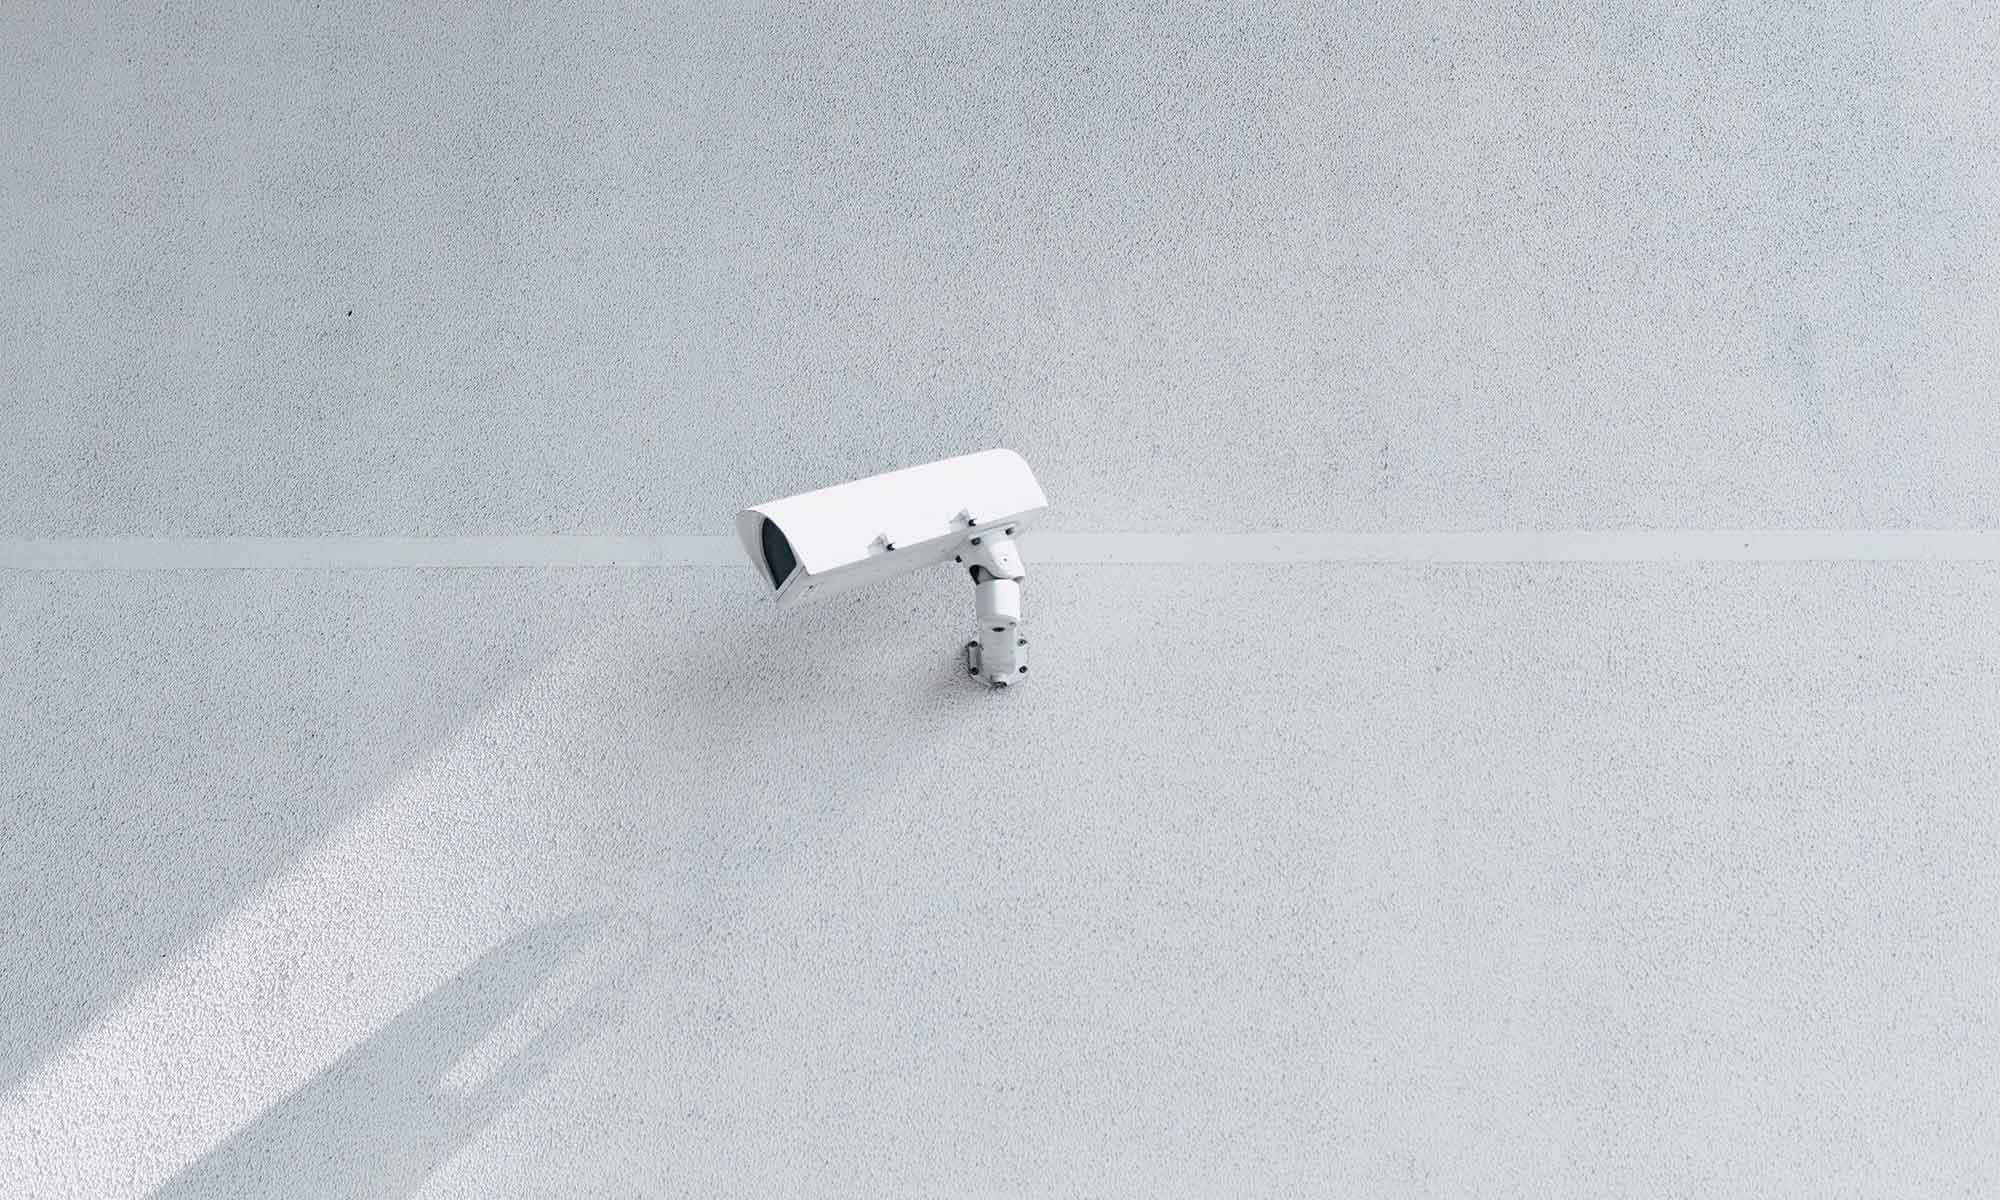 Camera on Wall